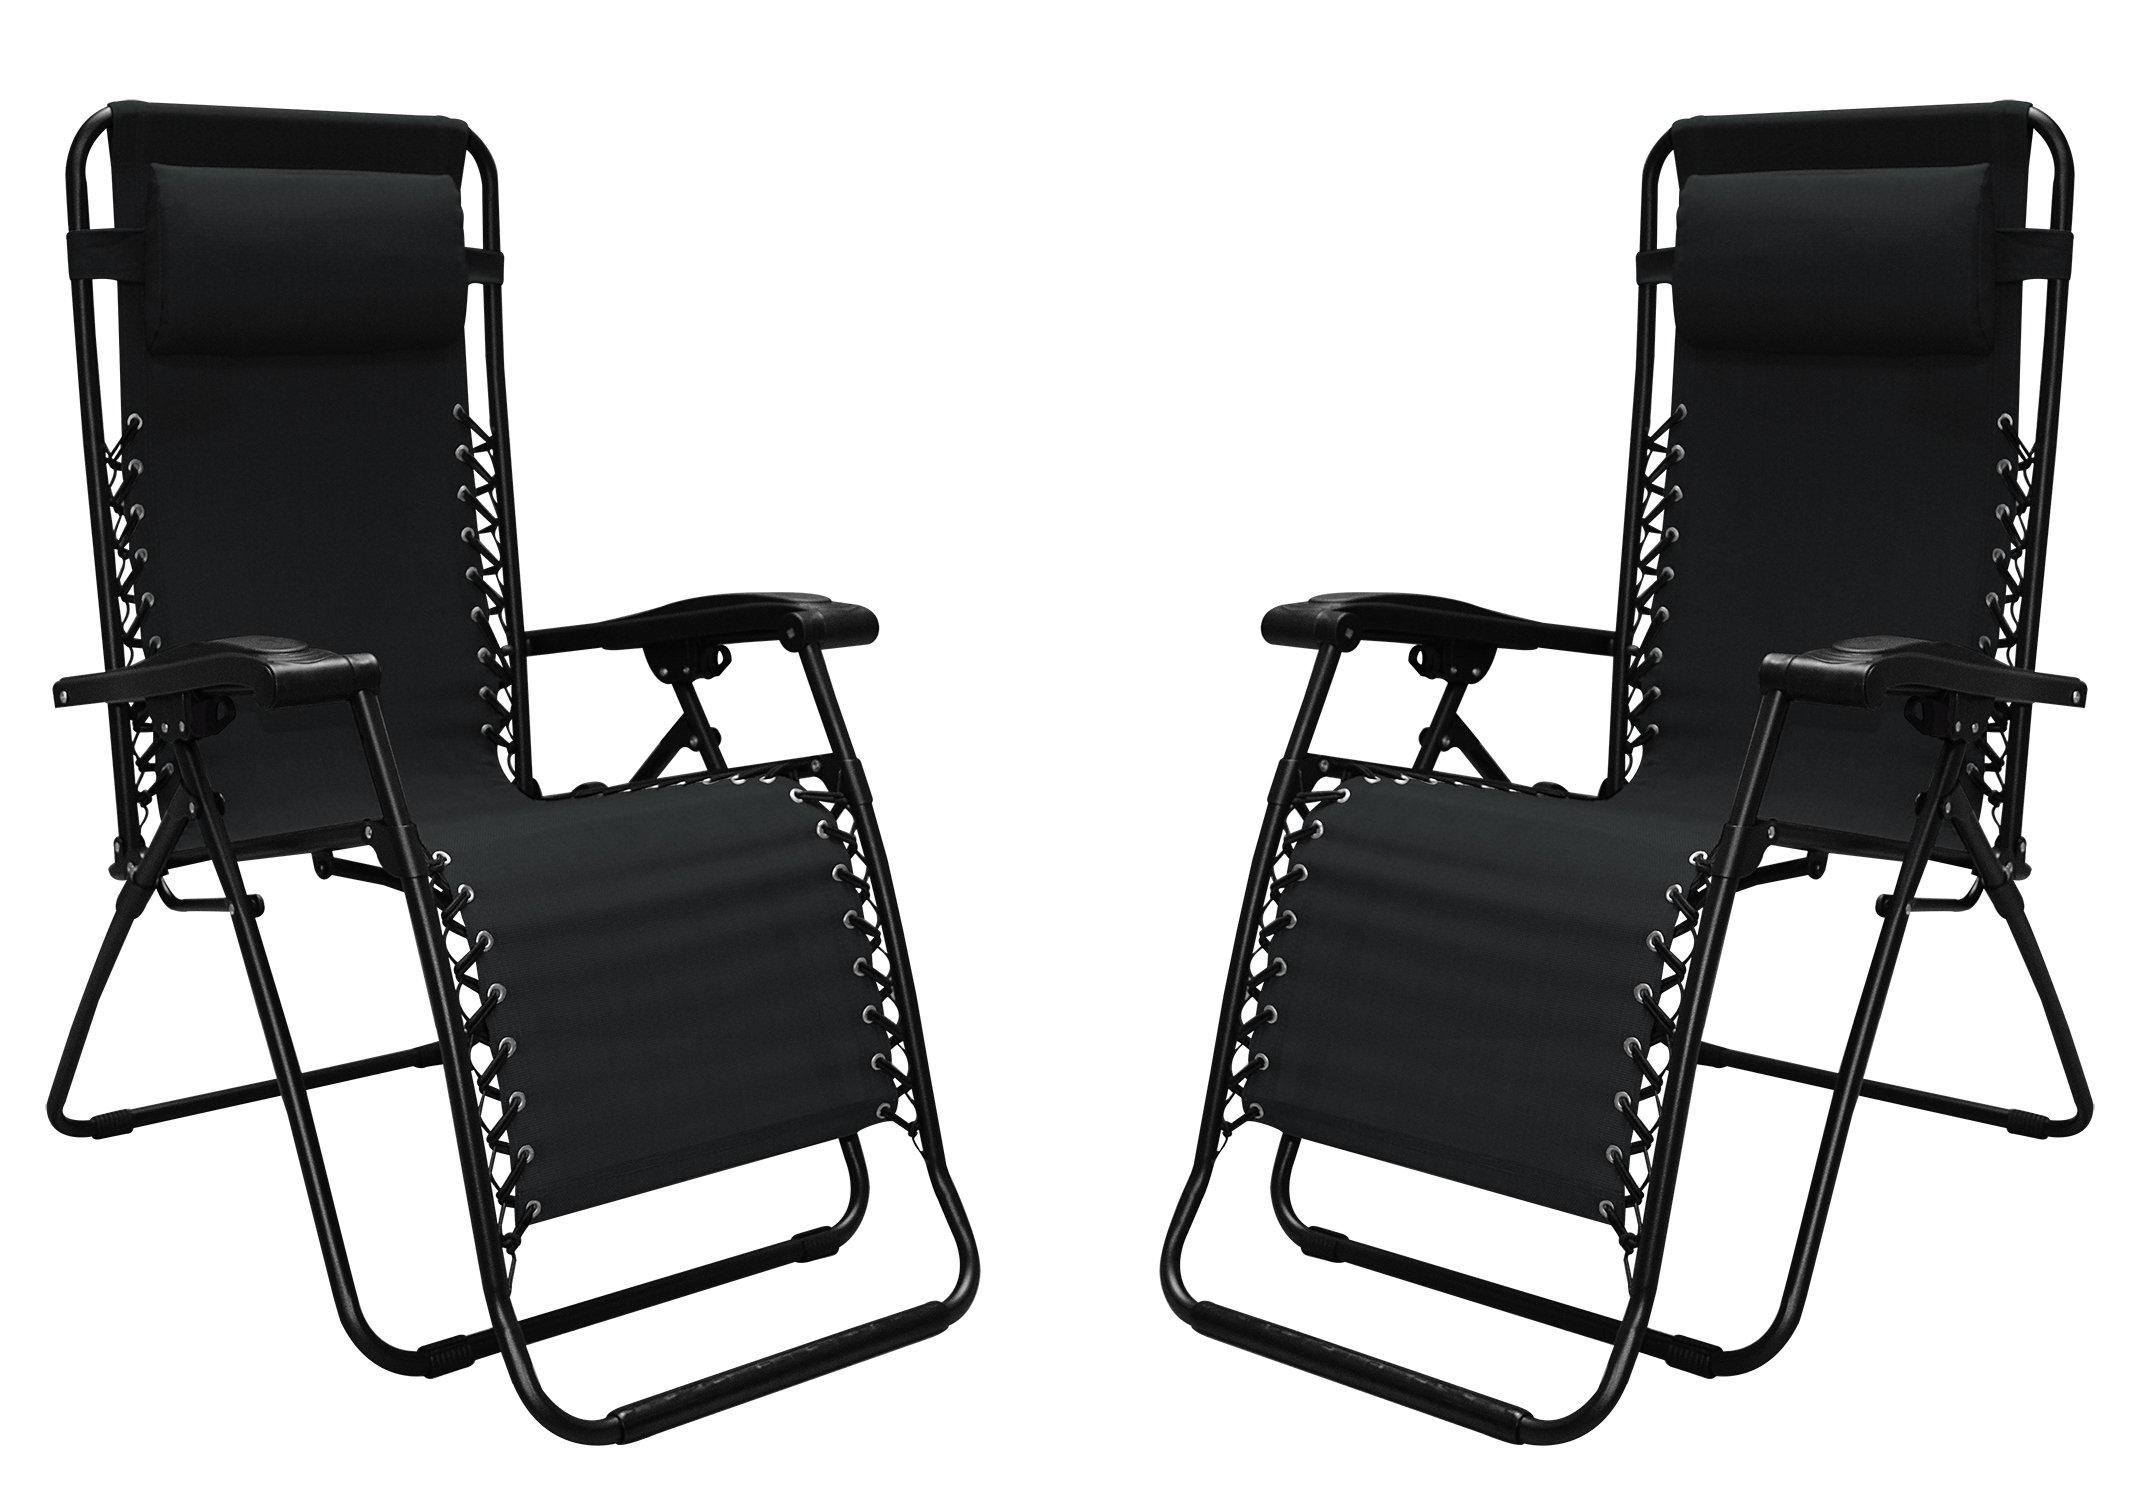 Caravan Sports Infinity Zero Gravity Chair - 2 Pack, Black